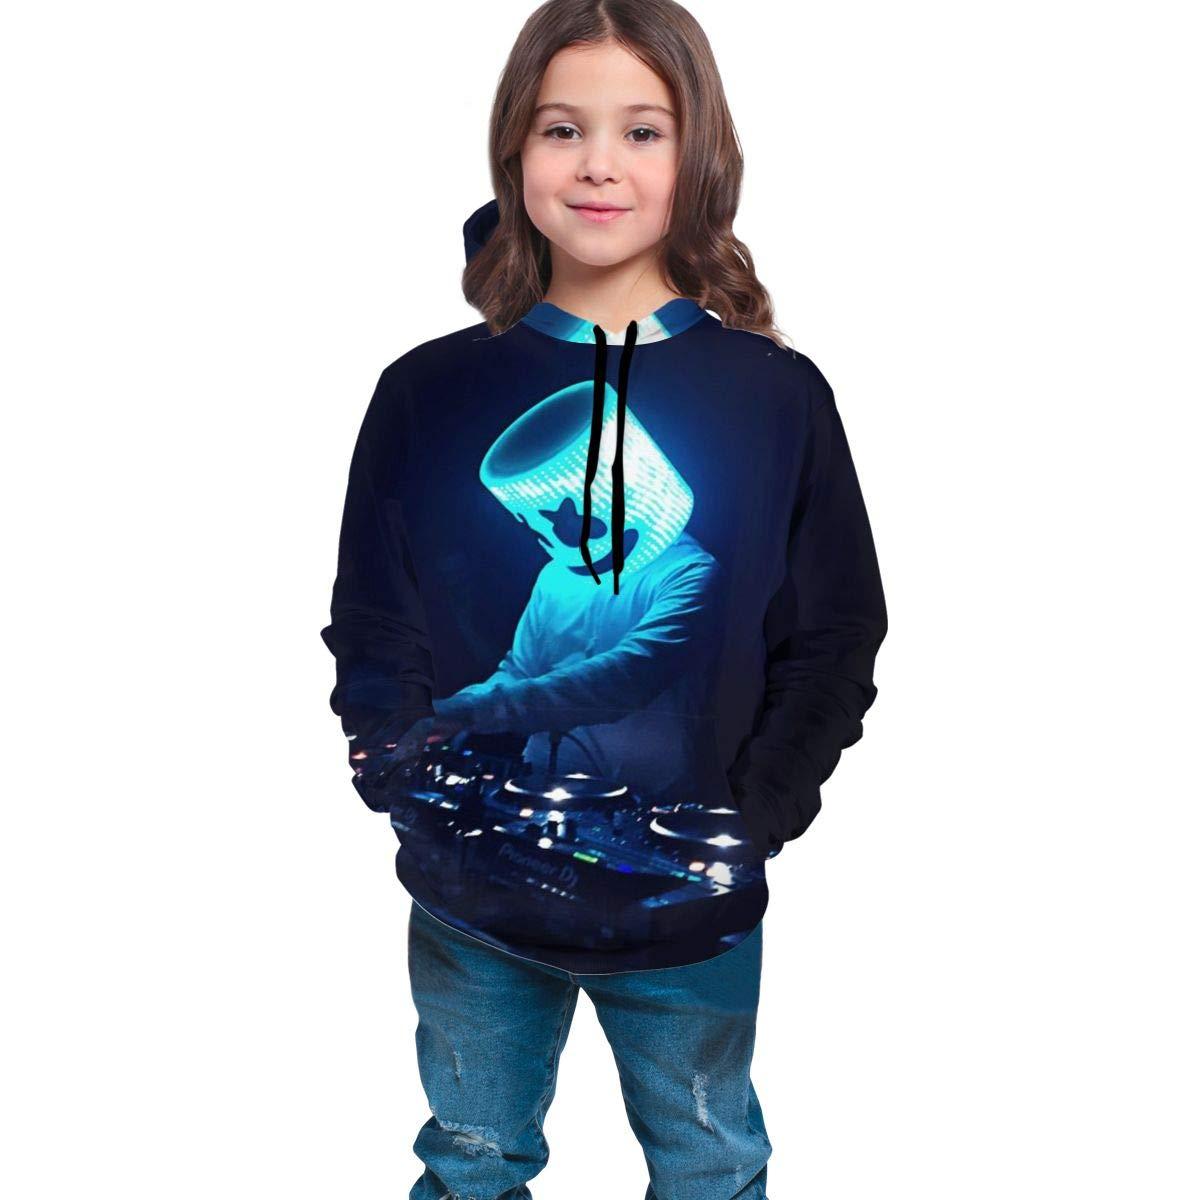 ALVHT Teen 3D Marshmellow DJ-Smile Hoodie Sweatshirt for Fashion Boys Girls